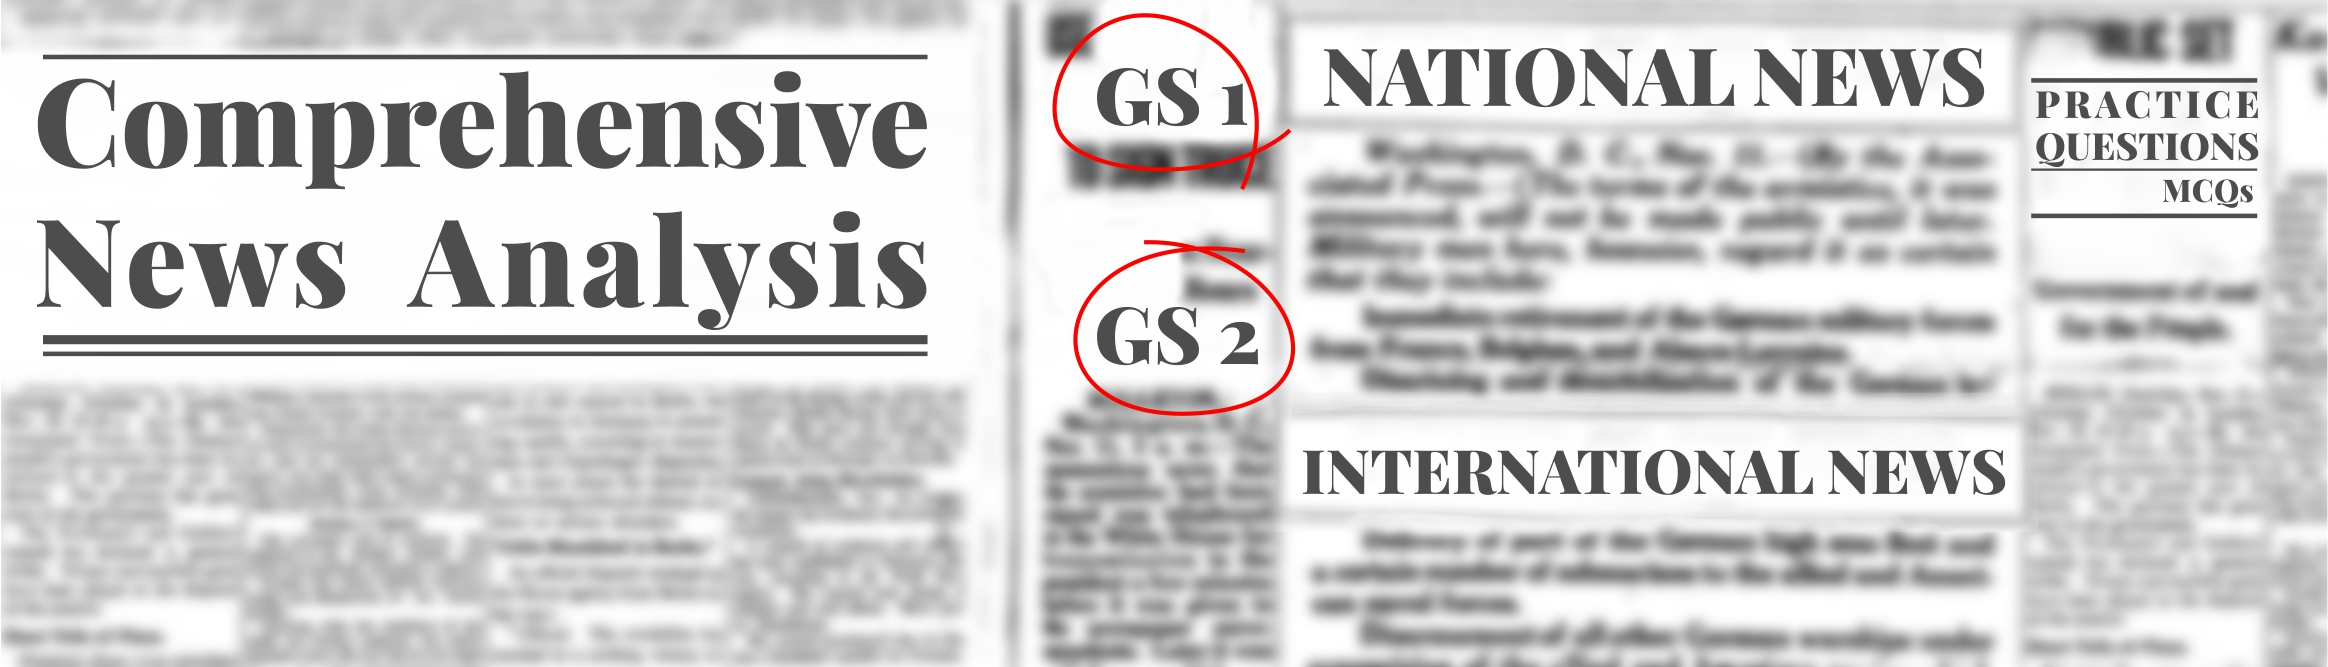 UPSC CUrrent Affairs 2016: Comprehensive News Analysis